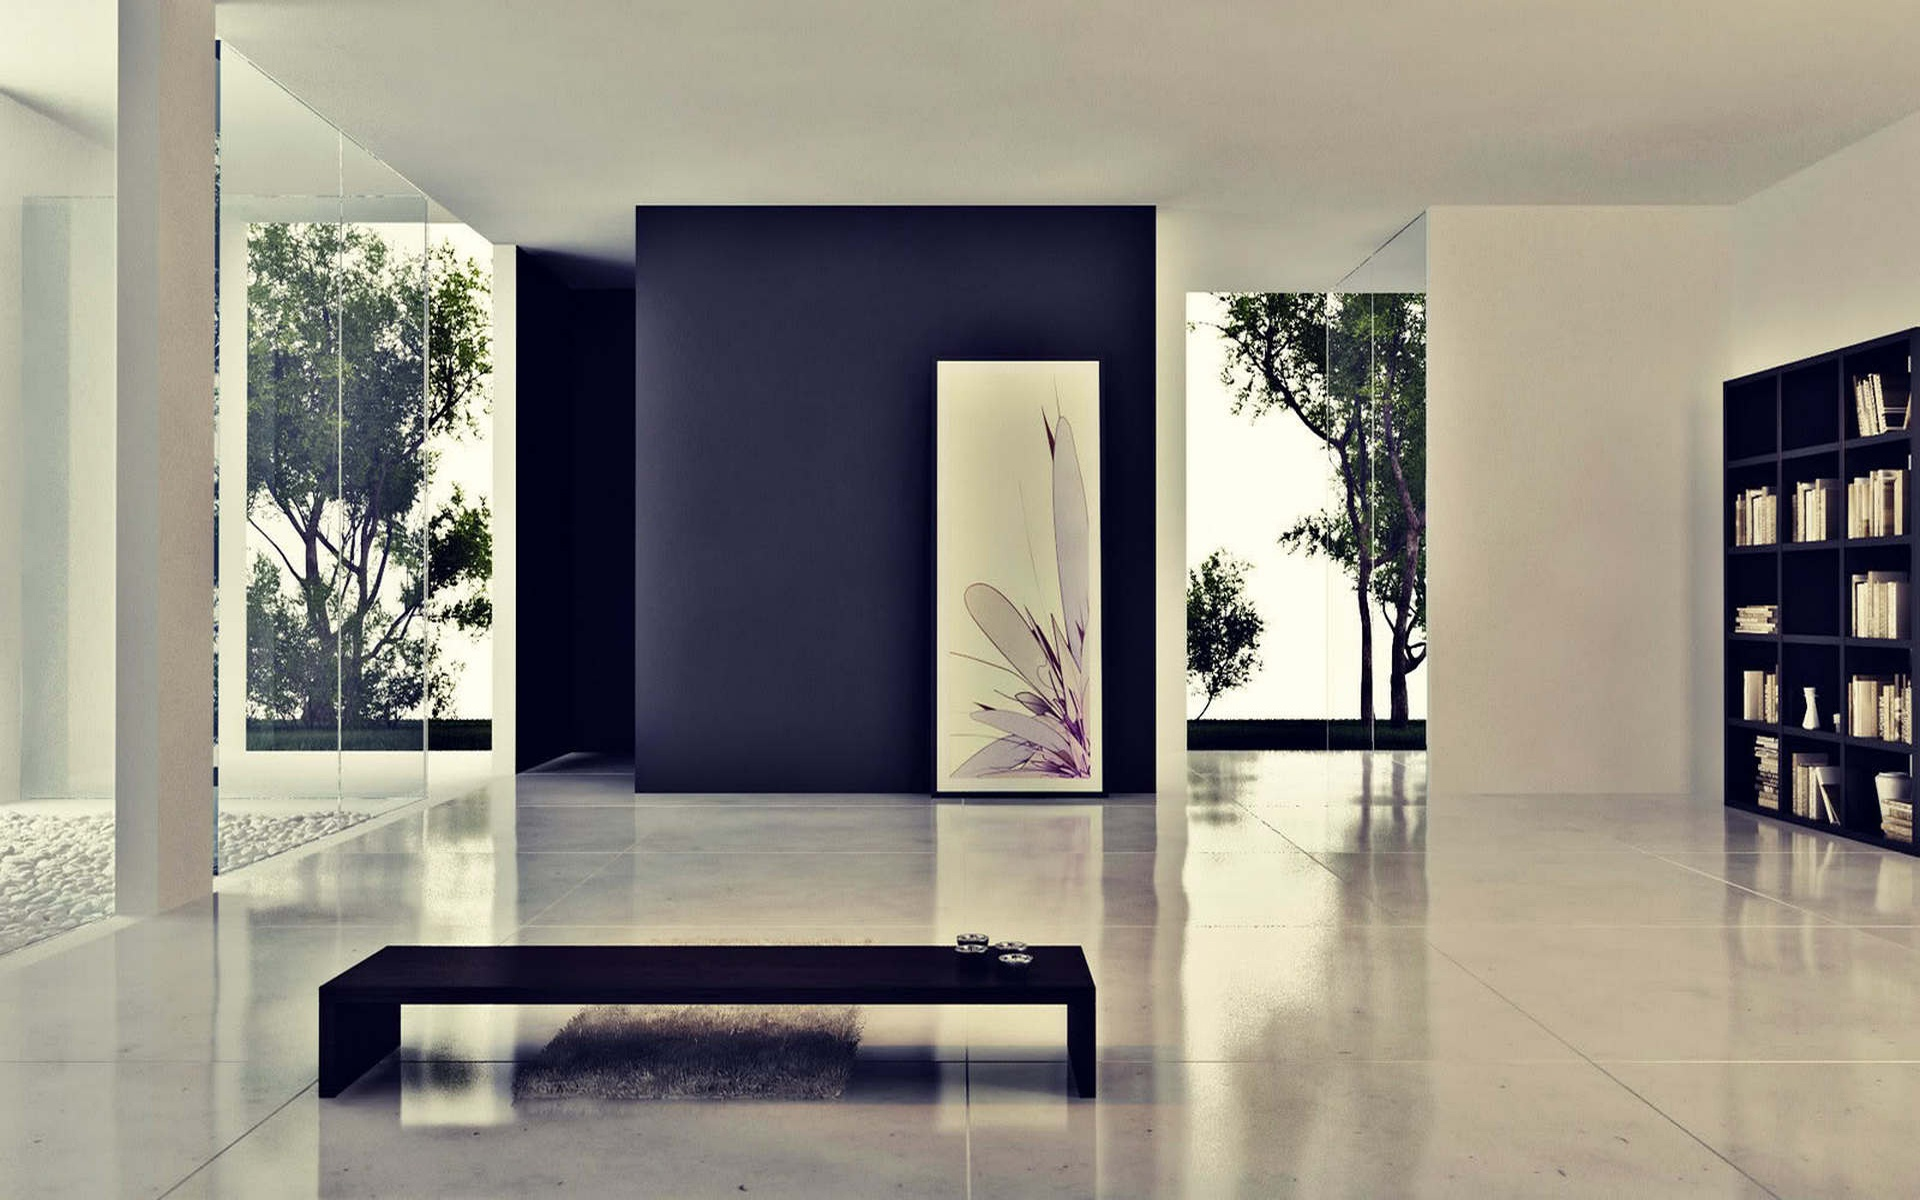 Livingroom Modern Interior Home Design Wallpaper Image 1920x1200